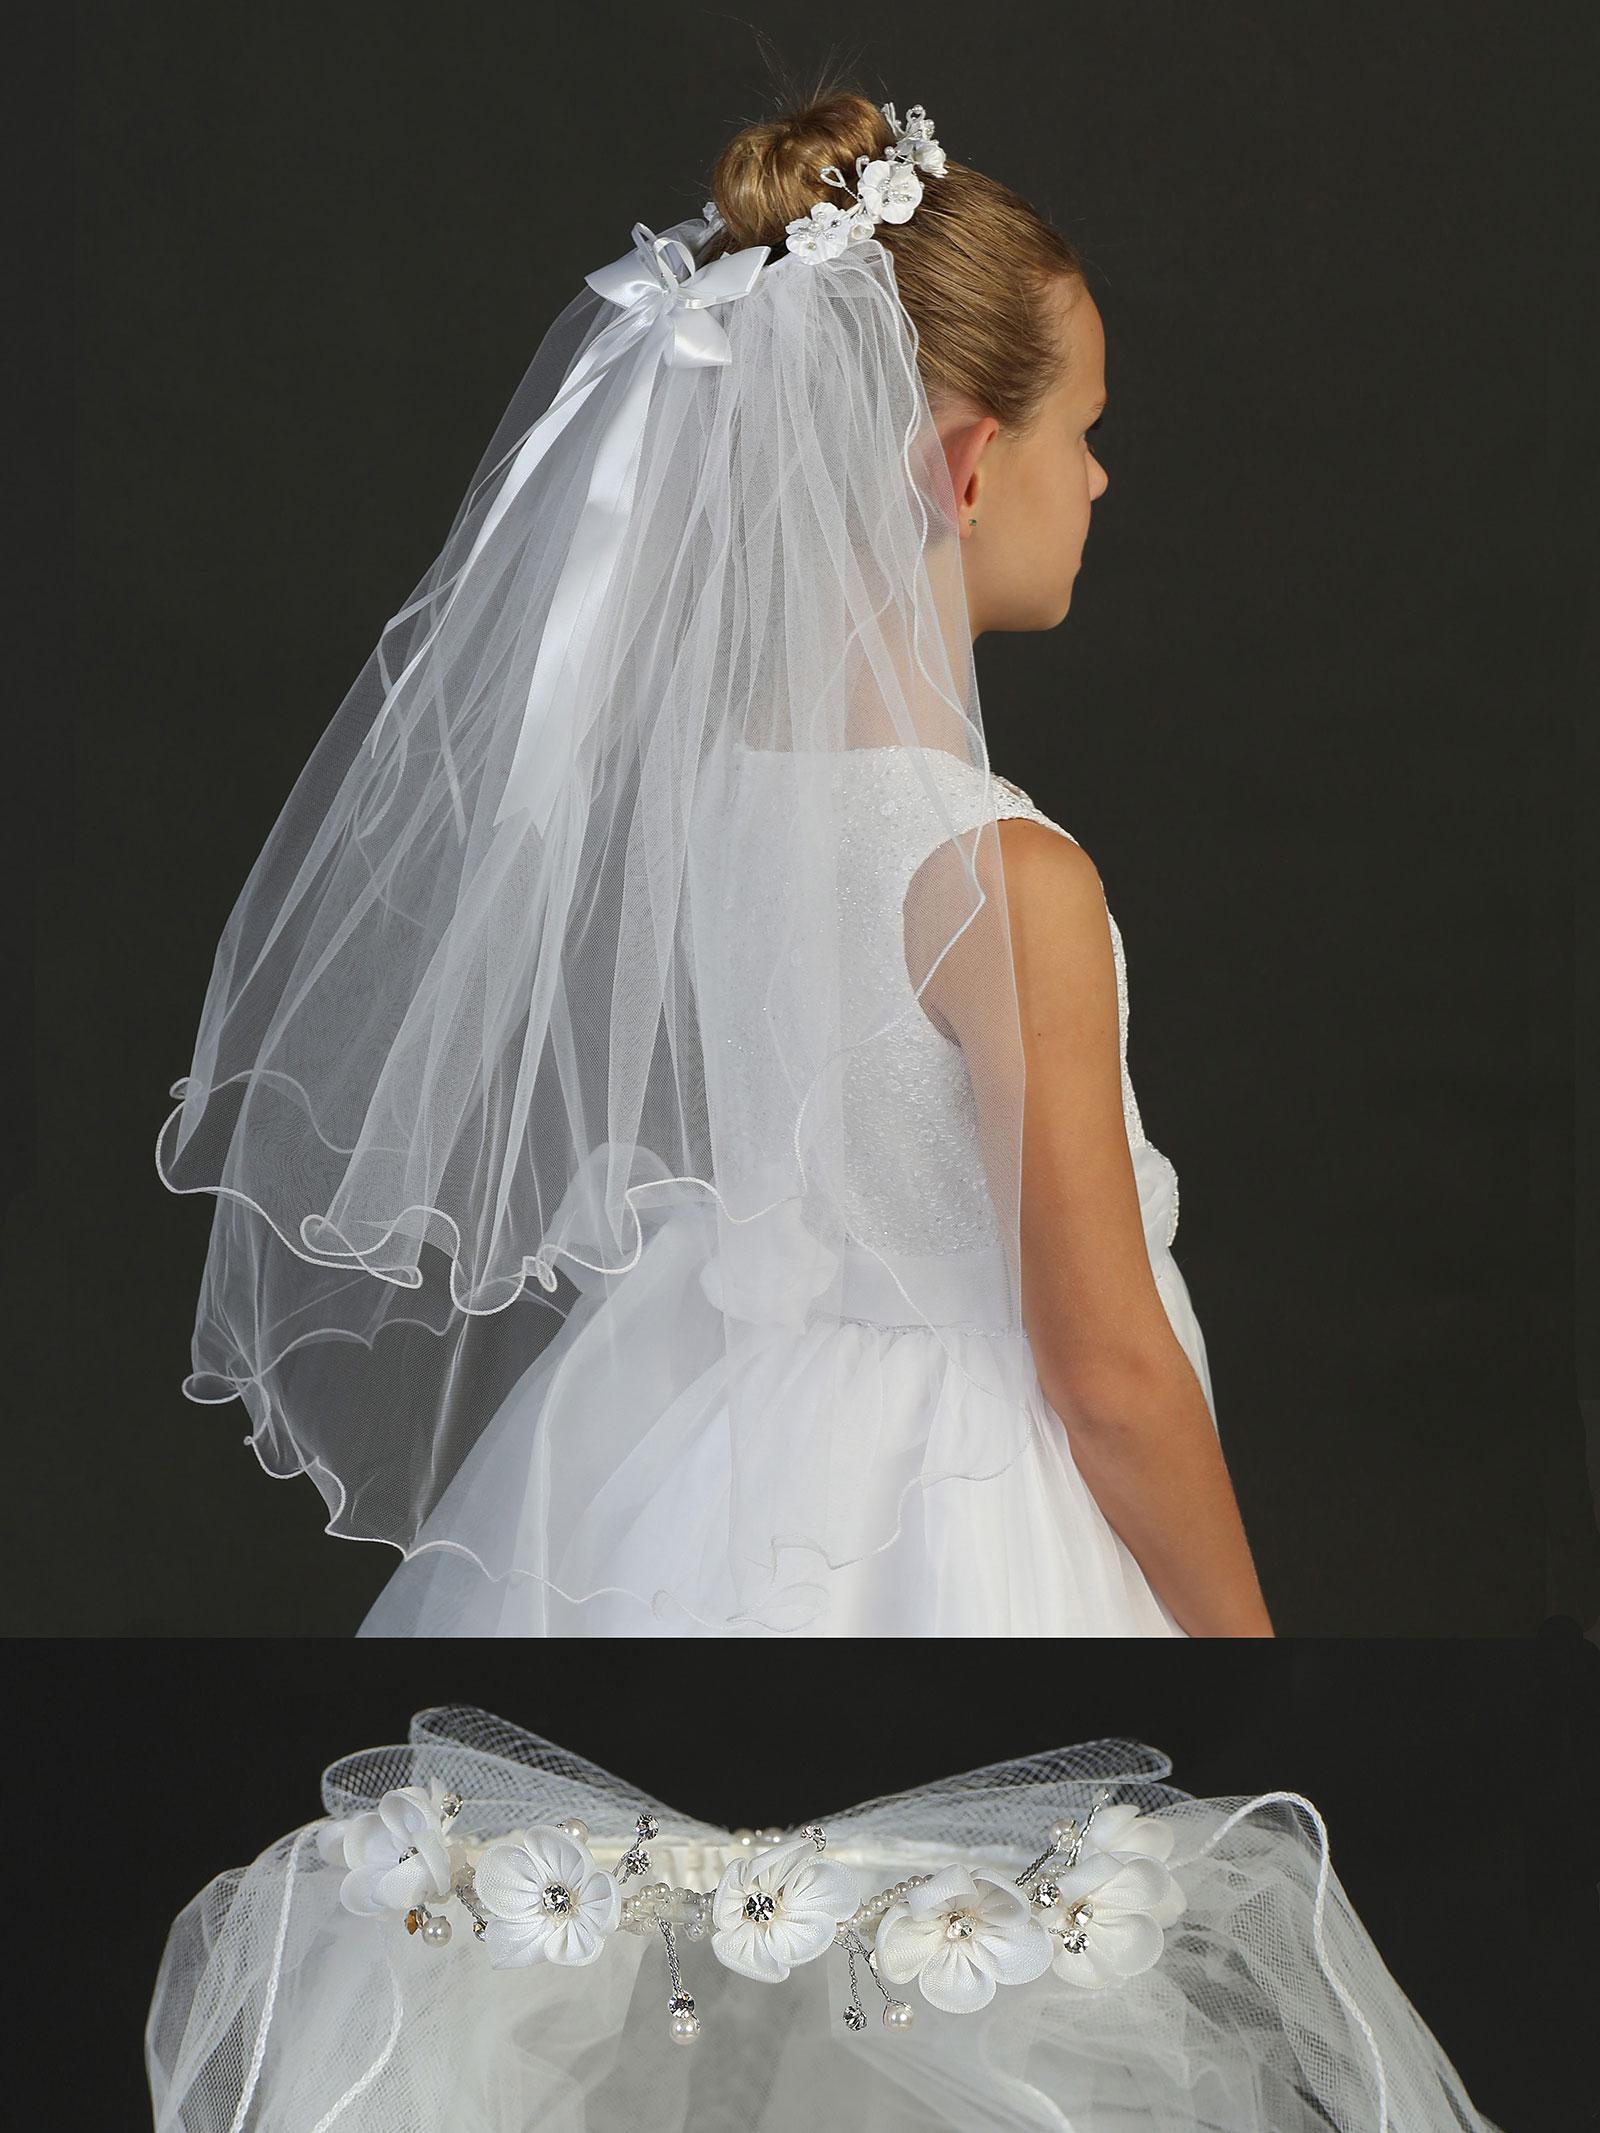 TT 752 Girls Bun Wrap Style 752 Hair Bun Wraps Flower Girl Dresses